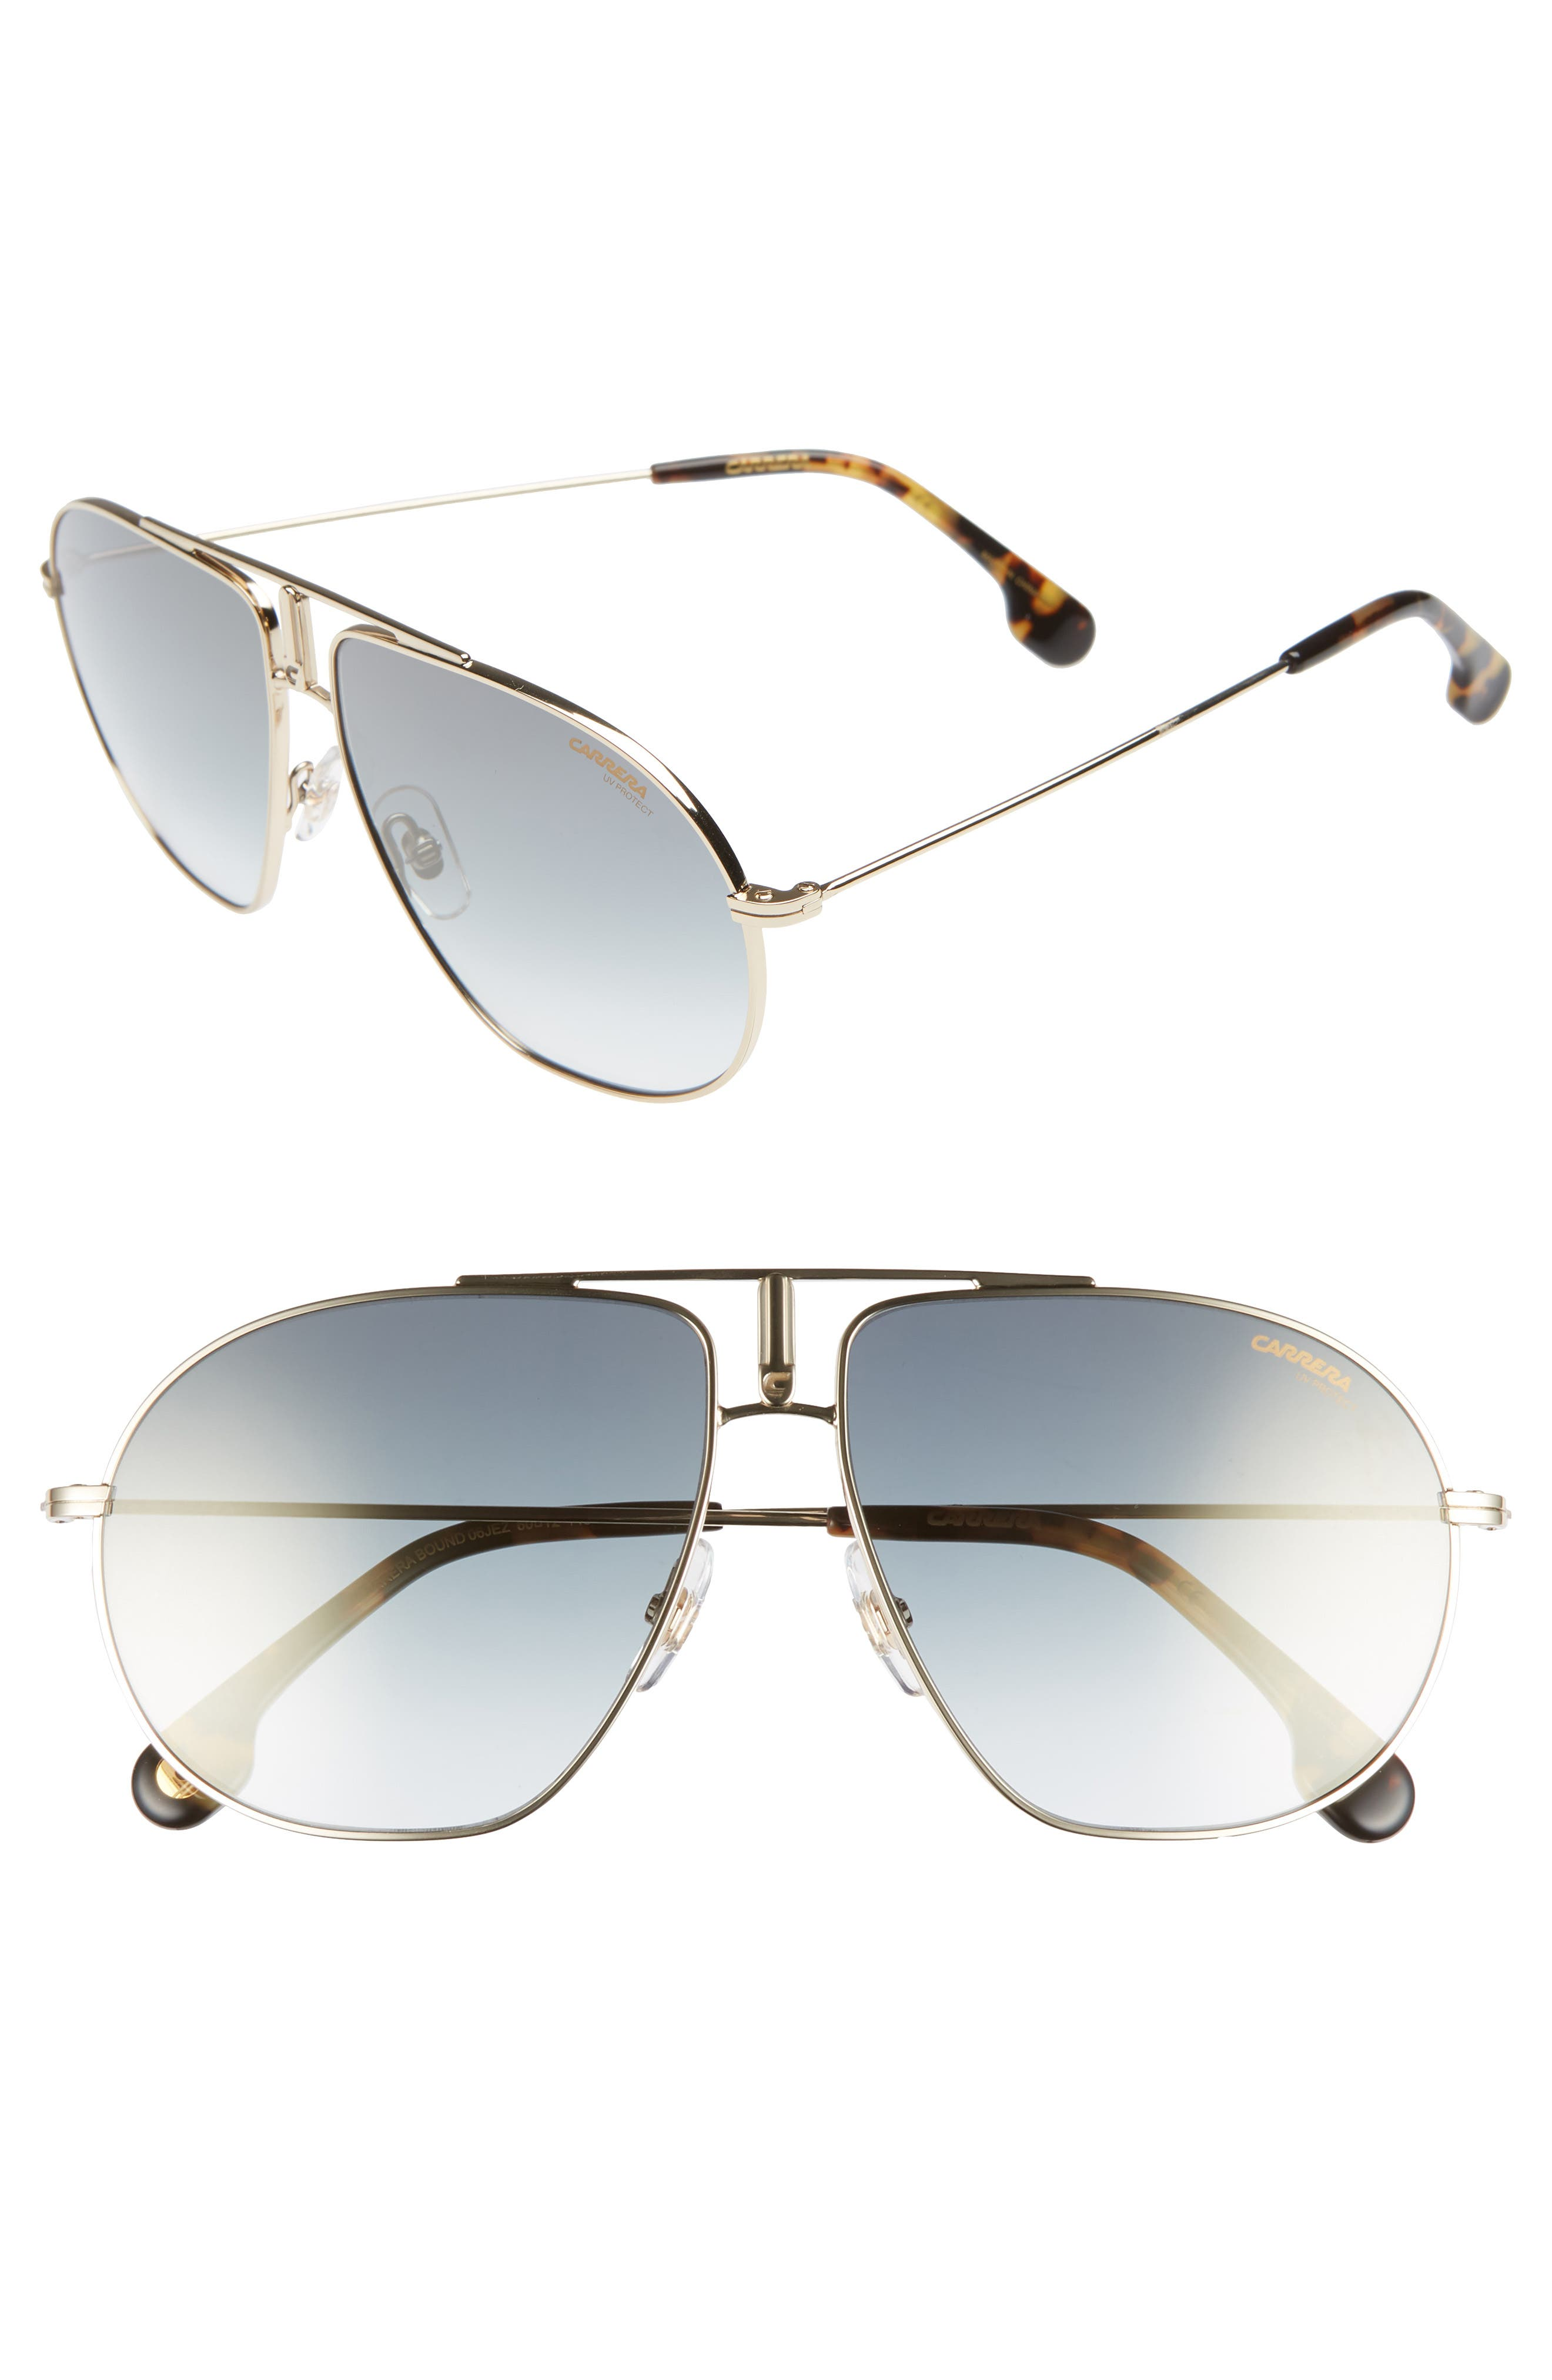 Bounds 60mm Gradient Aviator Sunglasses,                             Main thumbnail 1, color,                             GOLD